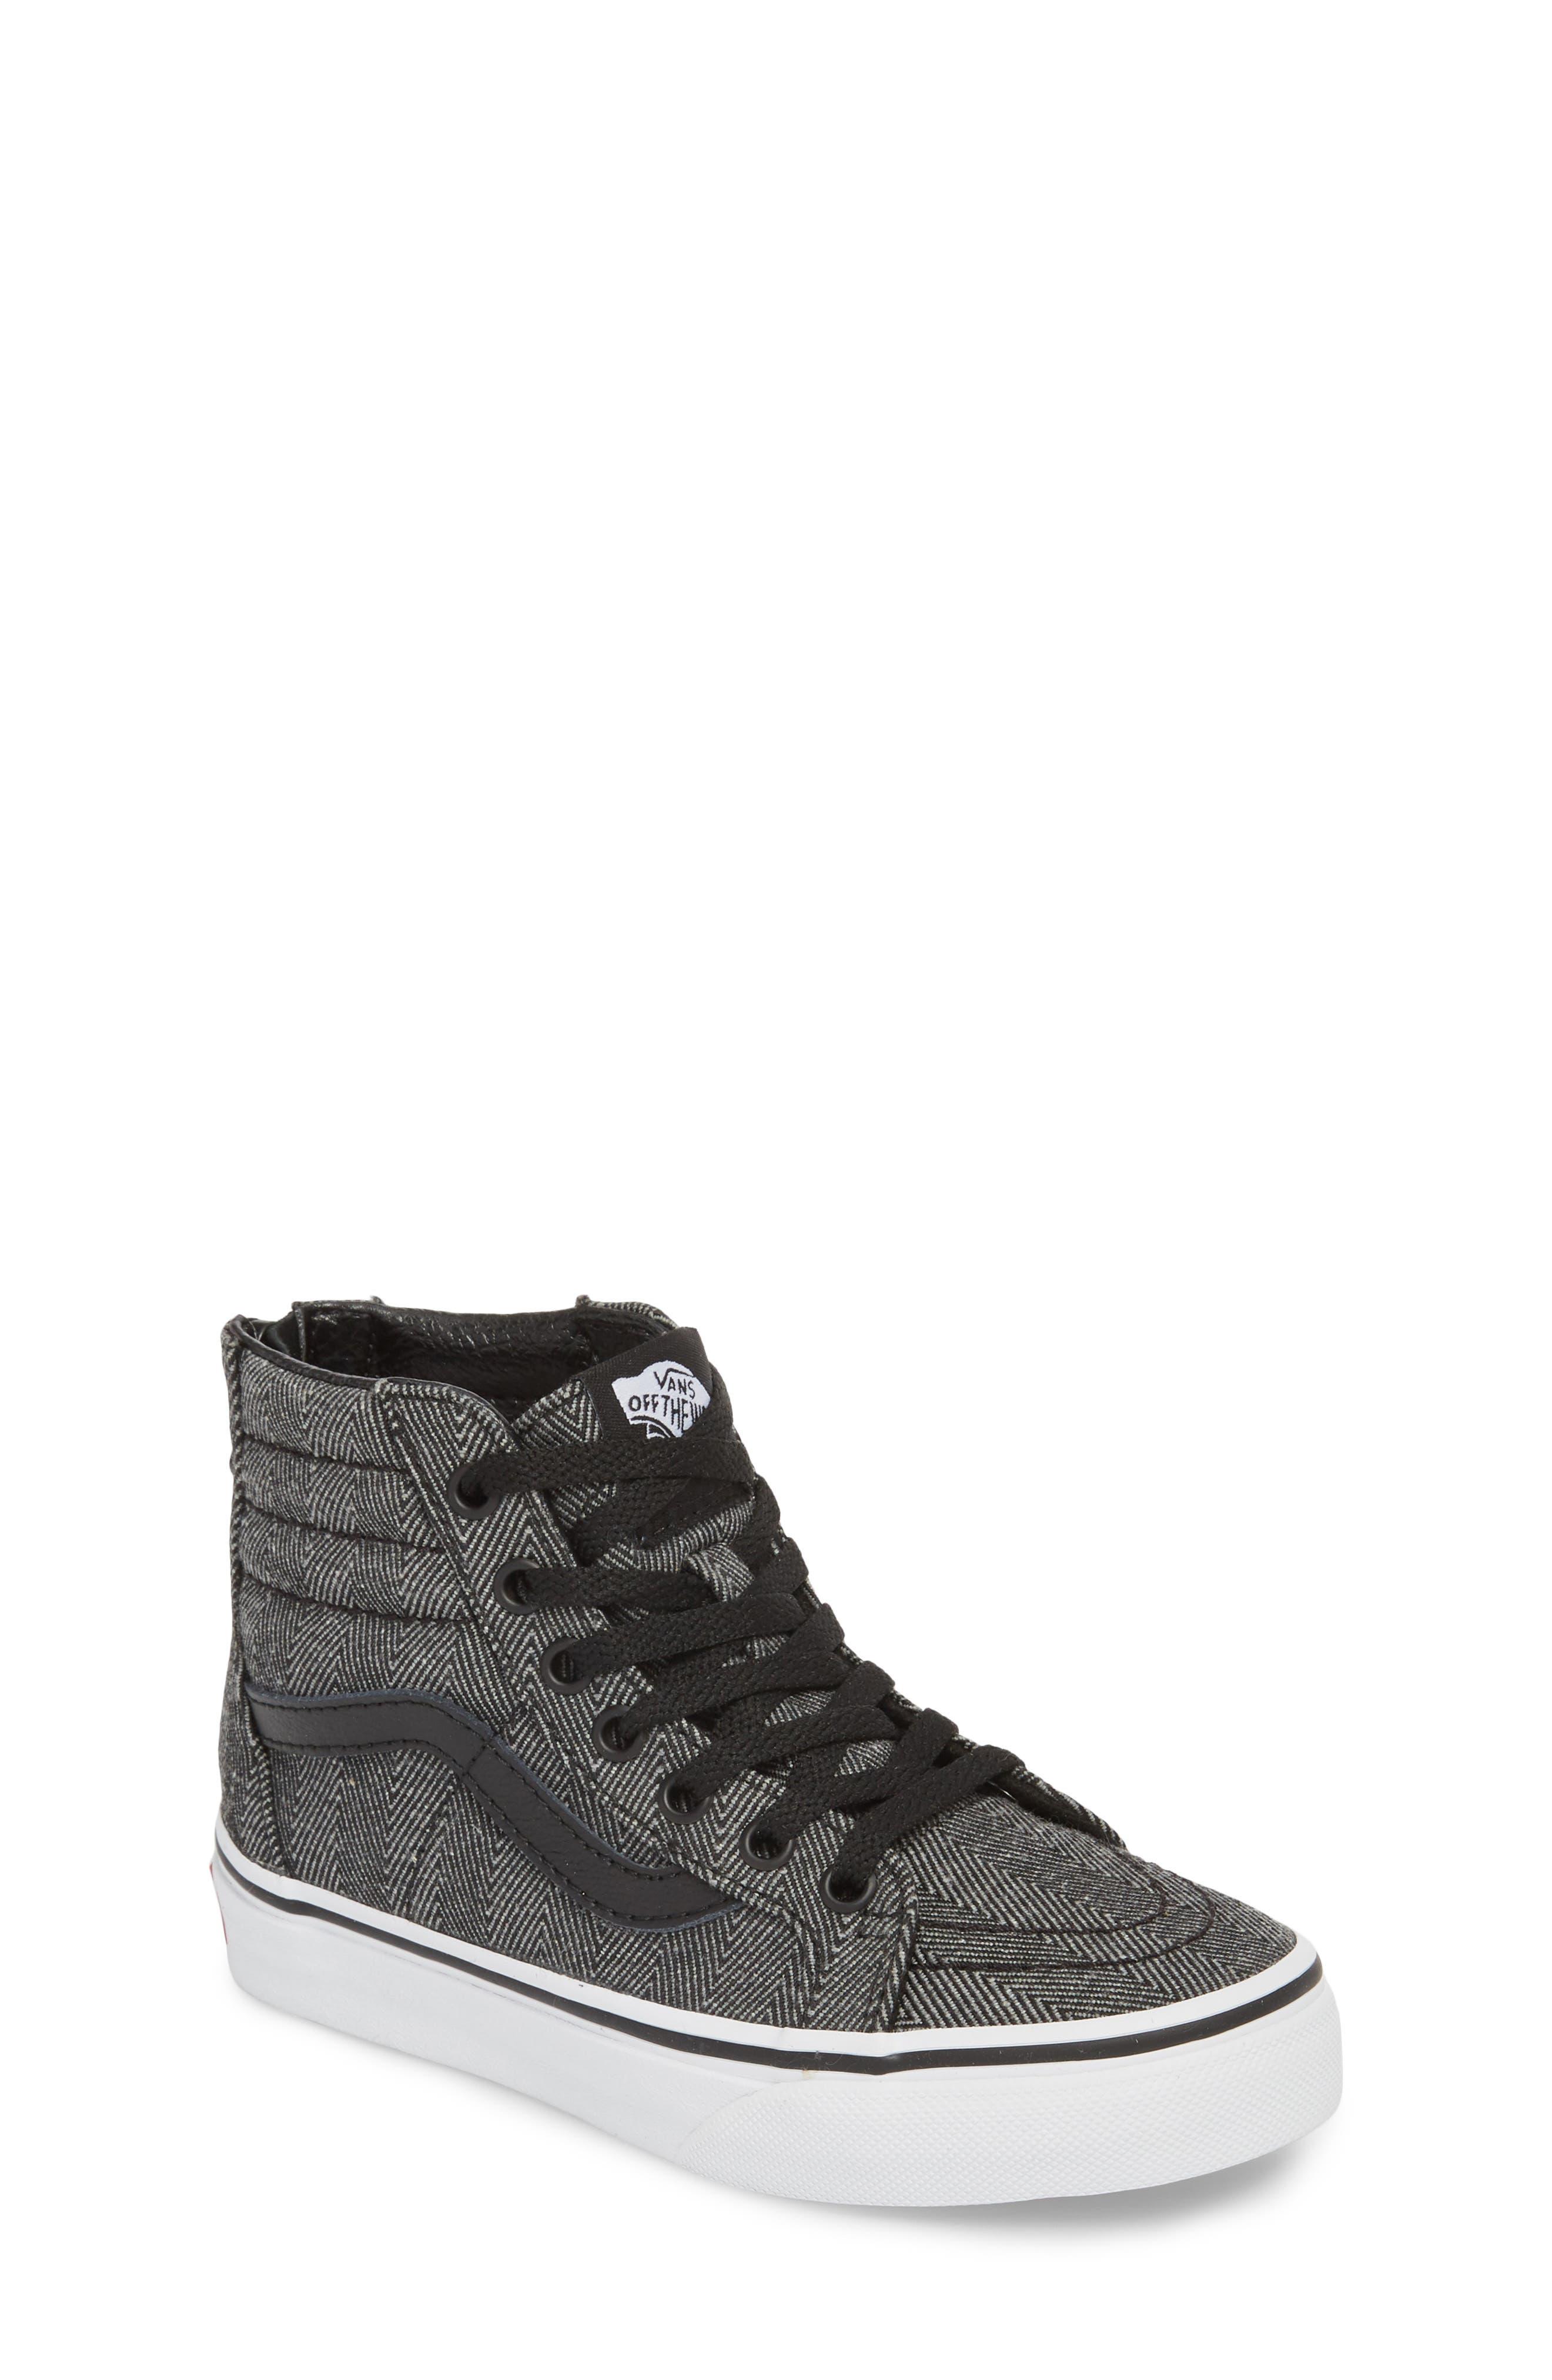 'Sk8-Hi' Sneaker,                             Main thumbnail 1, color,                             HERRINGBONE BLACK/ TRUE WHITE